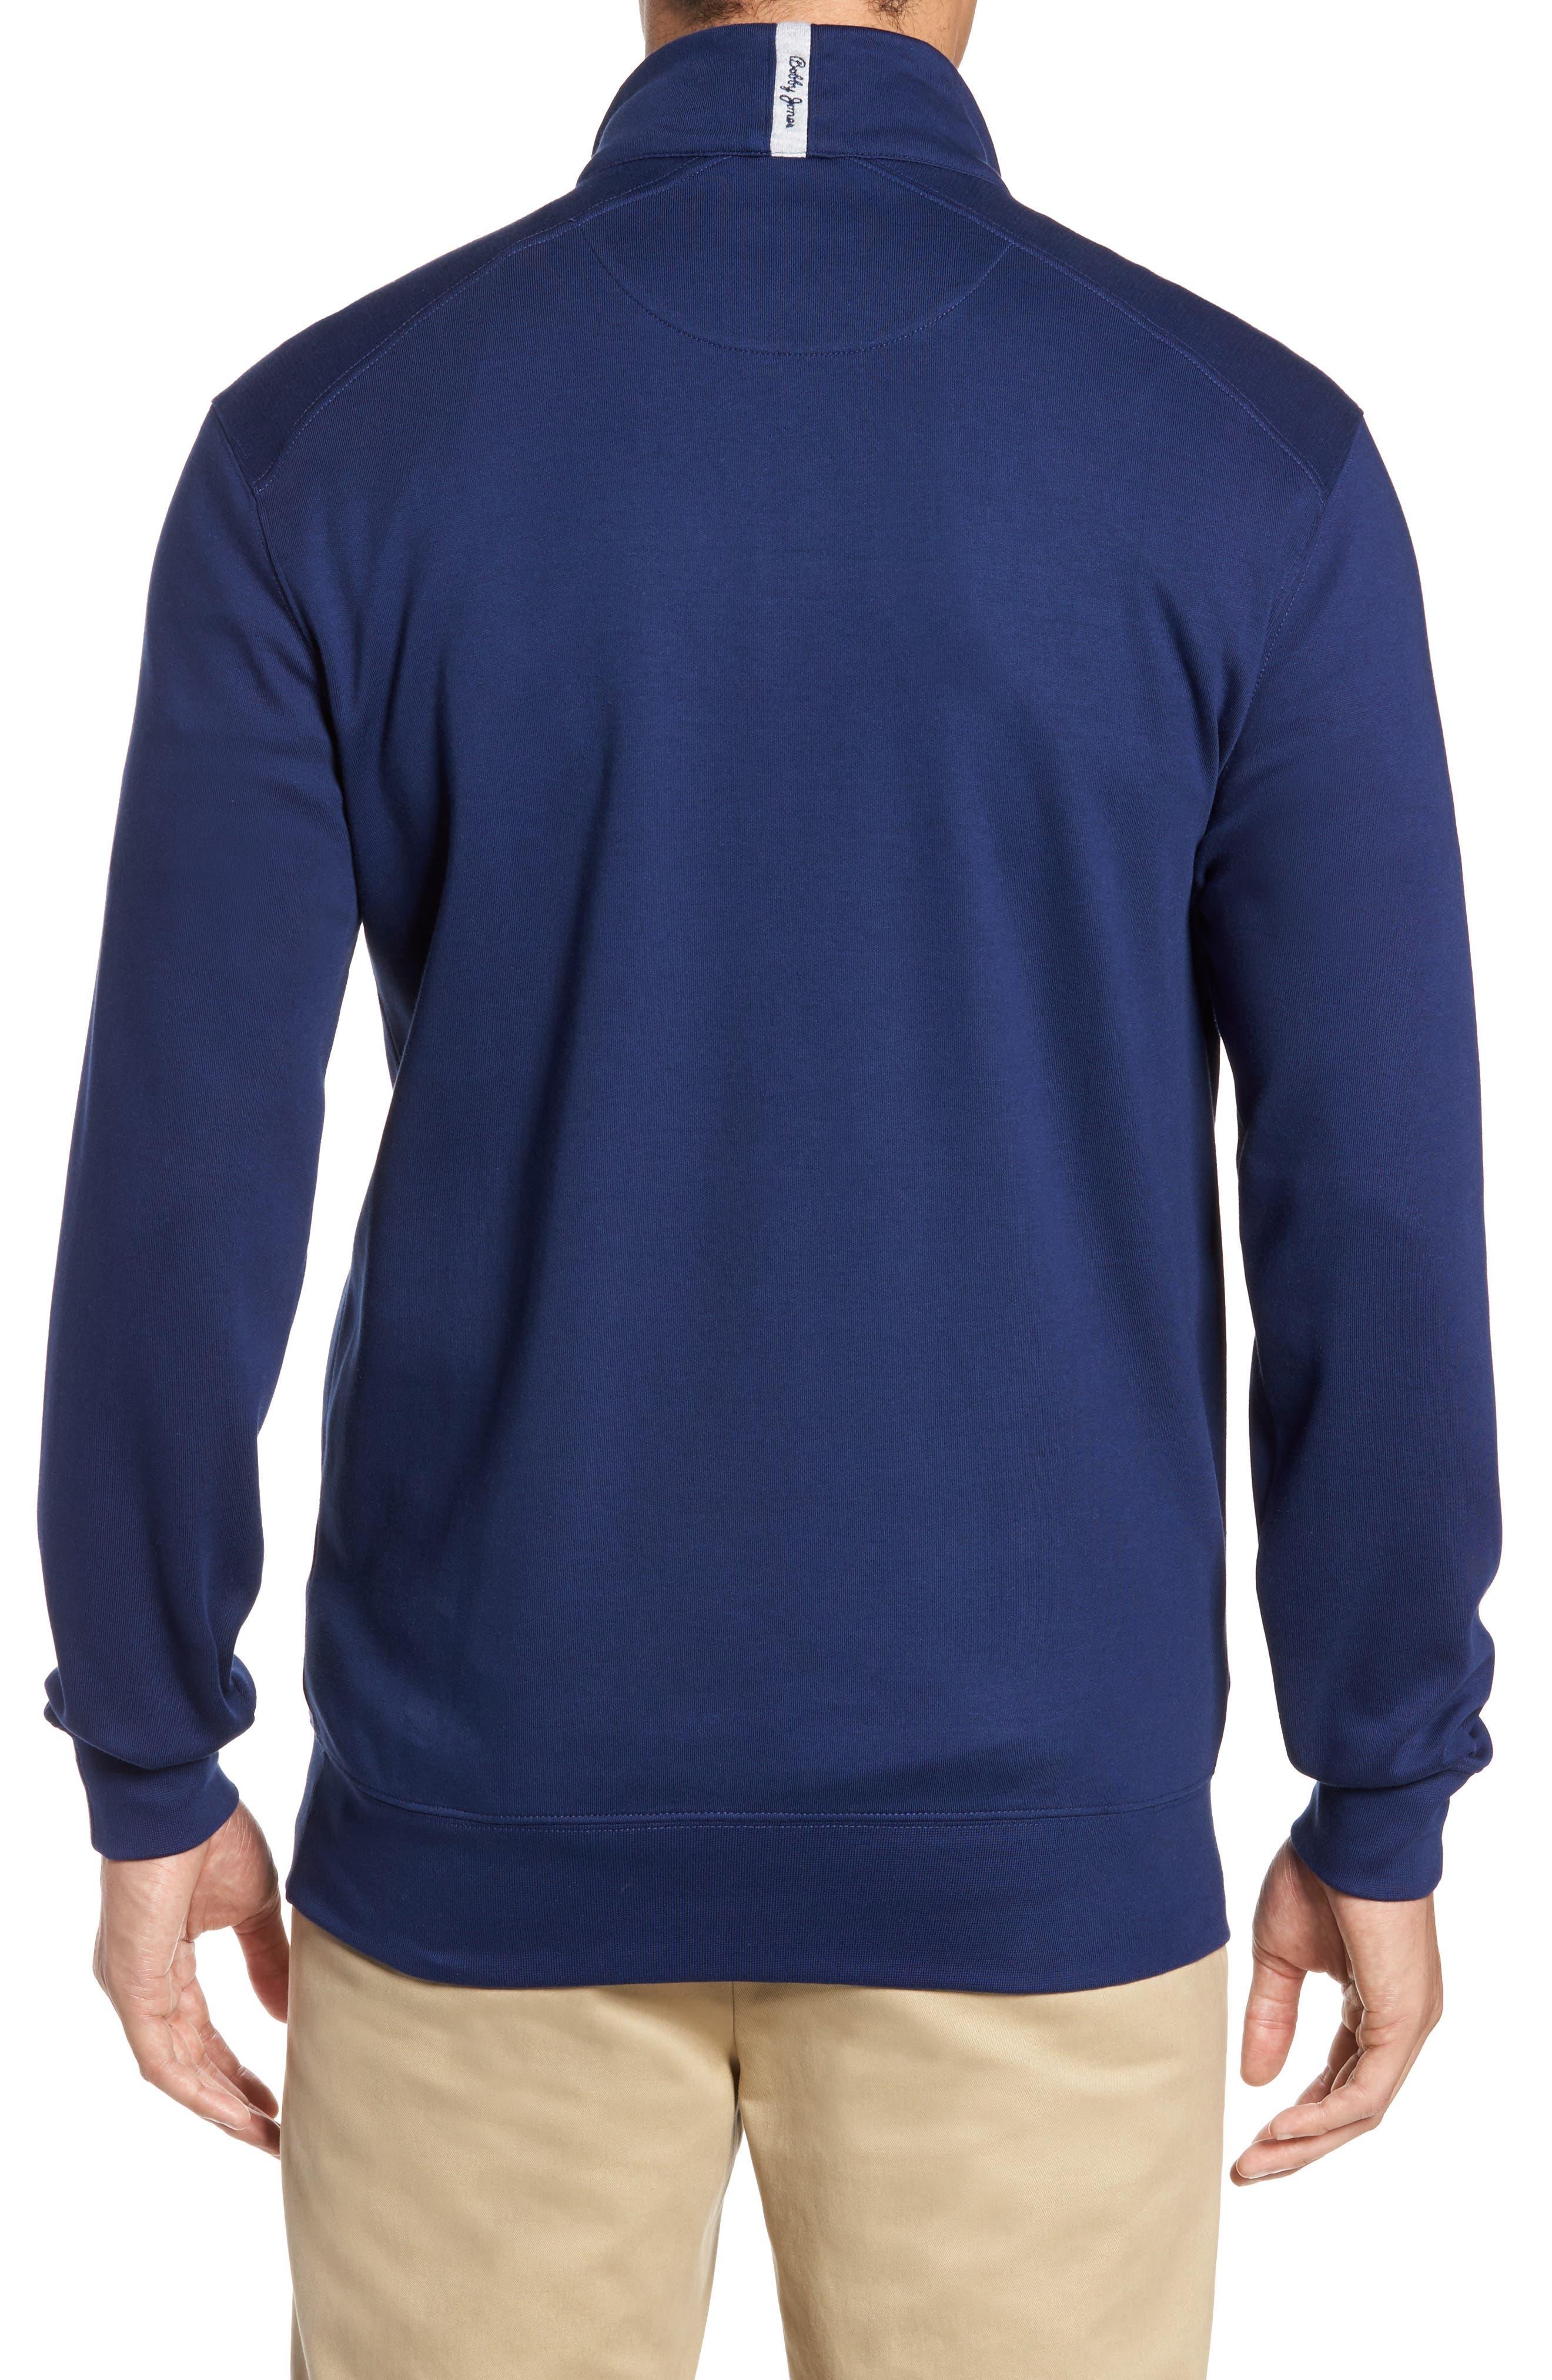 Alternate Image 2  - Bobby Jones 'New Leaderboard' Quarter Zip Pullover